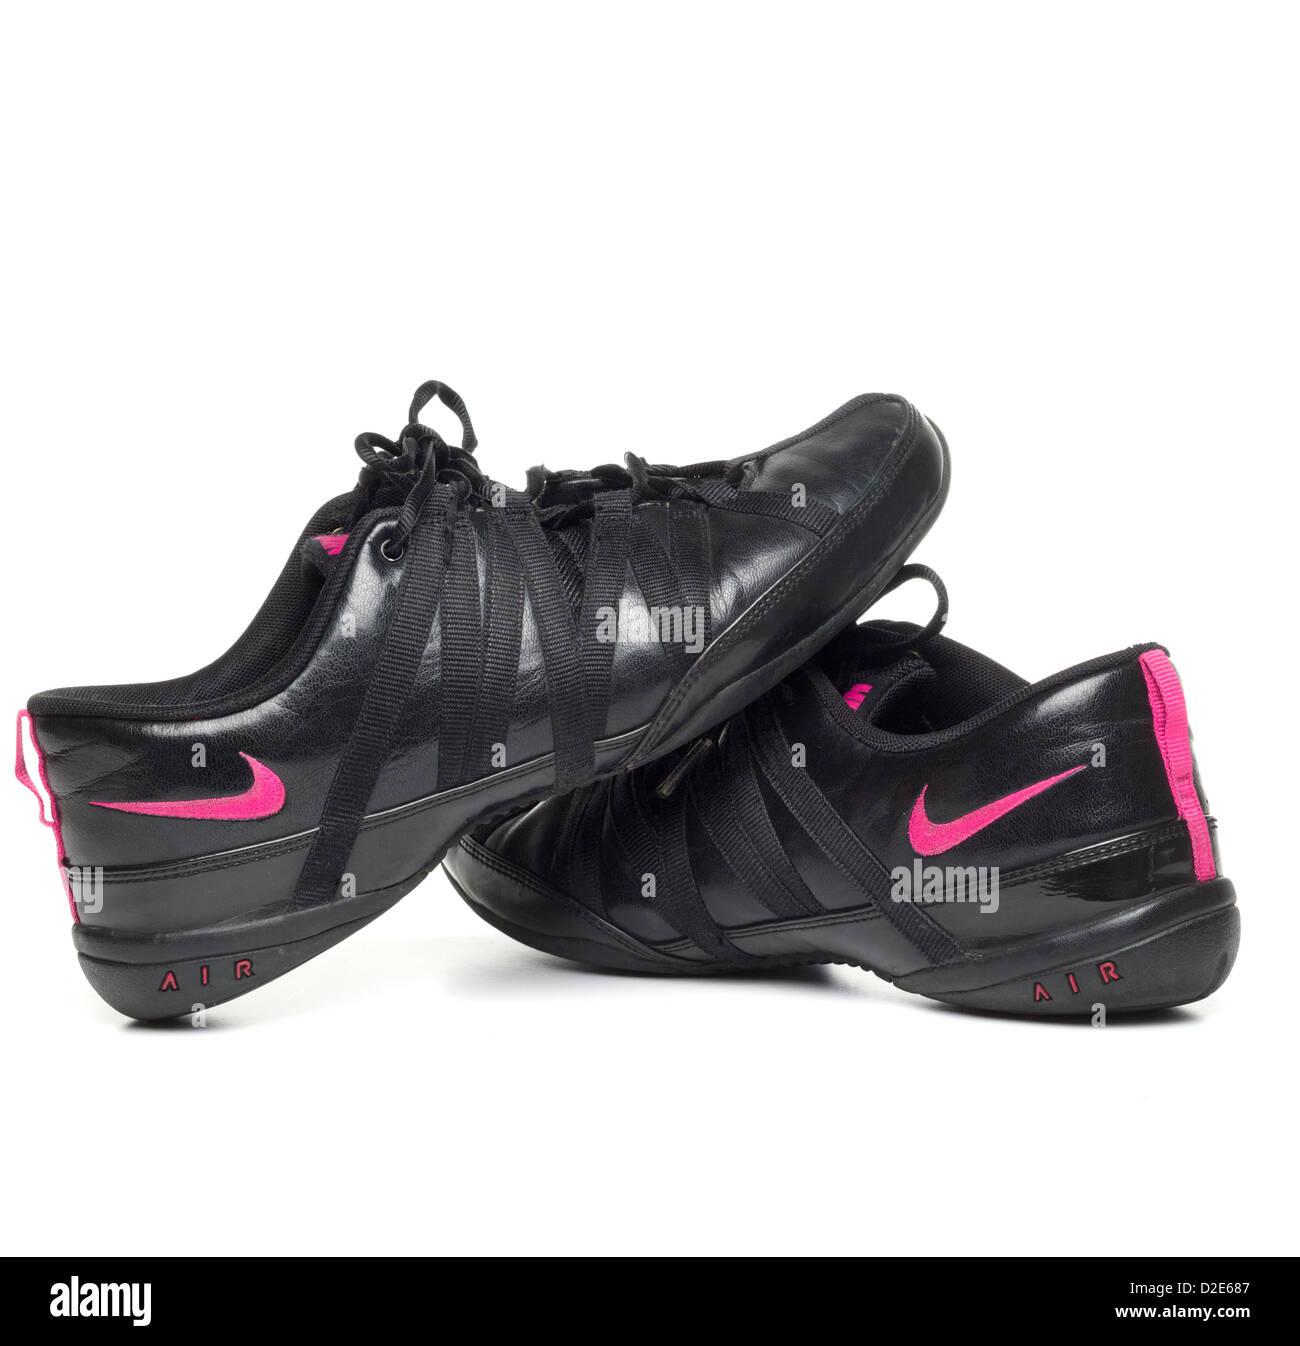 Nike Training Shoes Immagini   Nike Training Shoes Fotos Stock - Alamy d0b535a6046